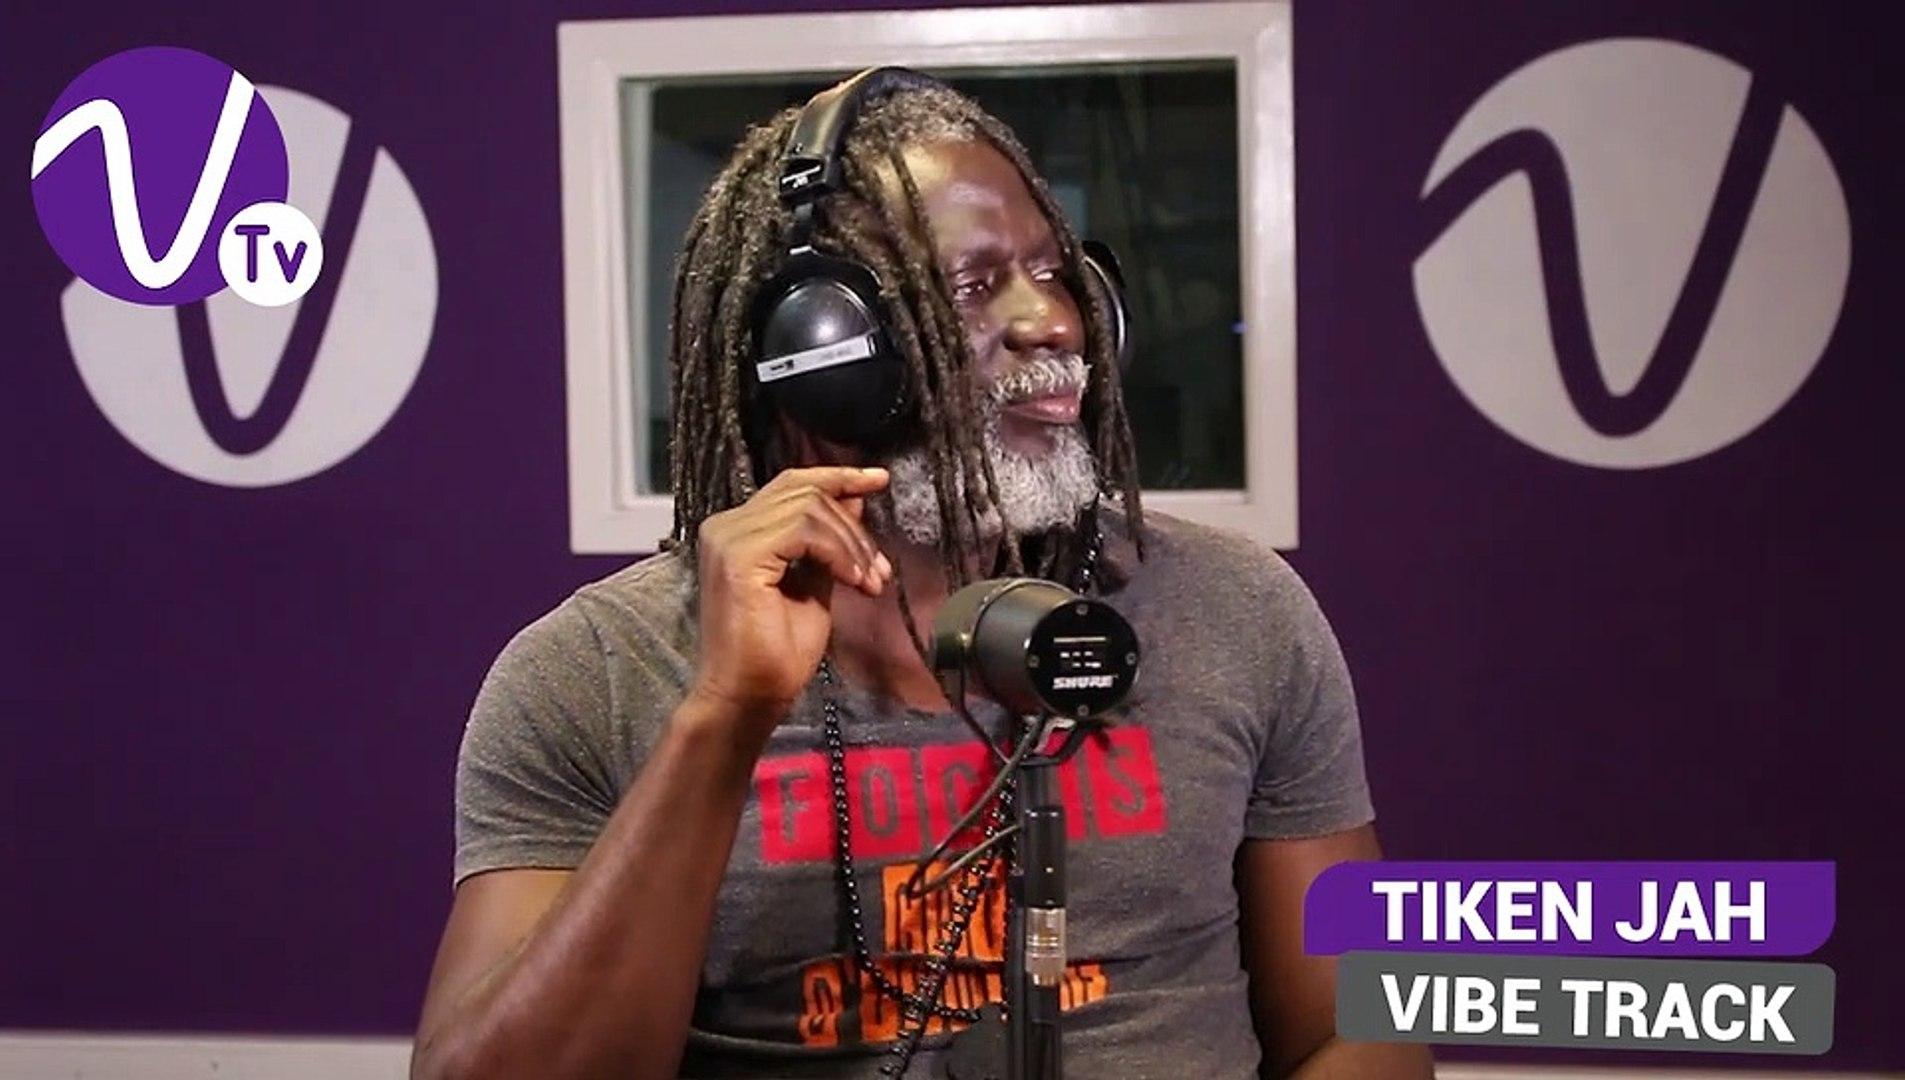 Vibe Track - Tiken Jah freestyle